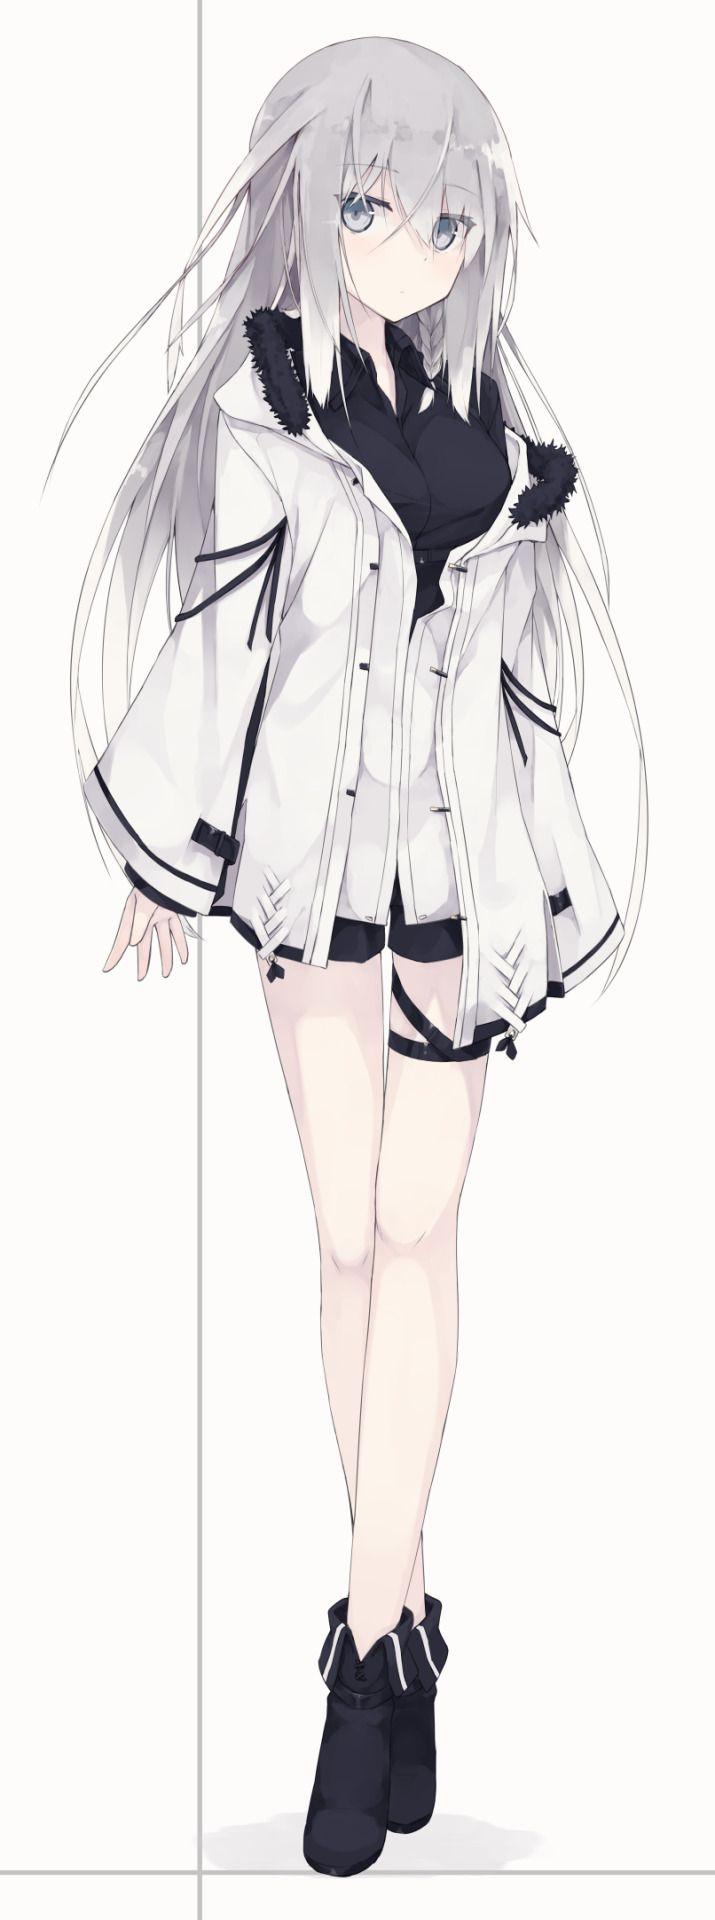 Ghim Tr 234 N Anime Girl